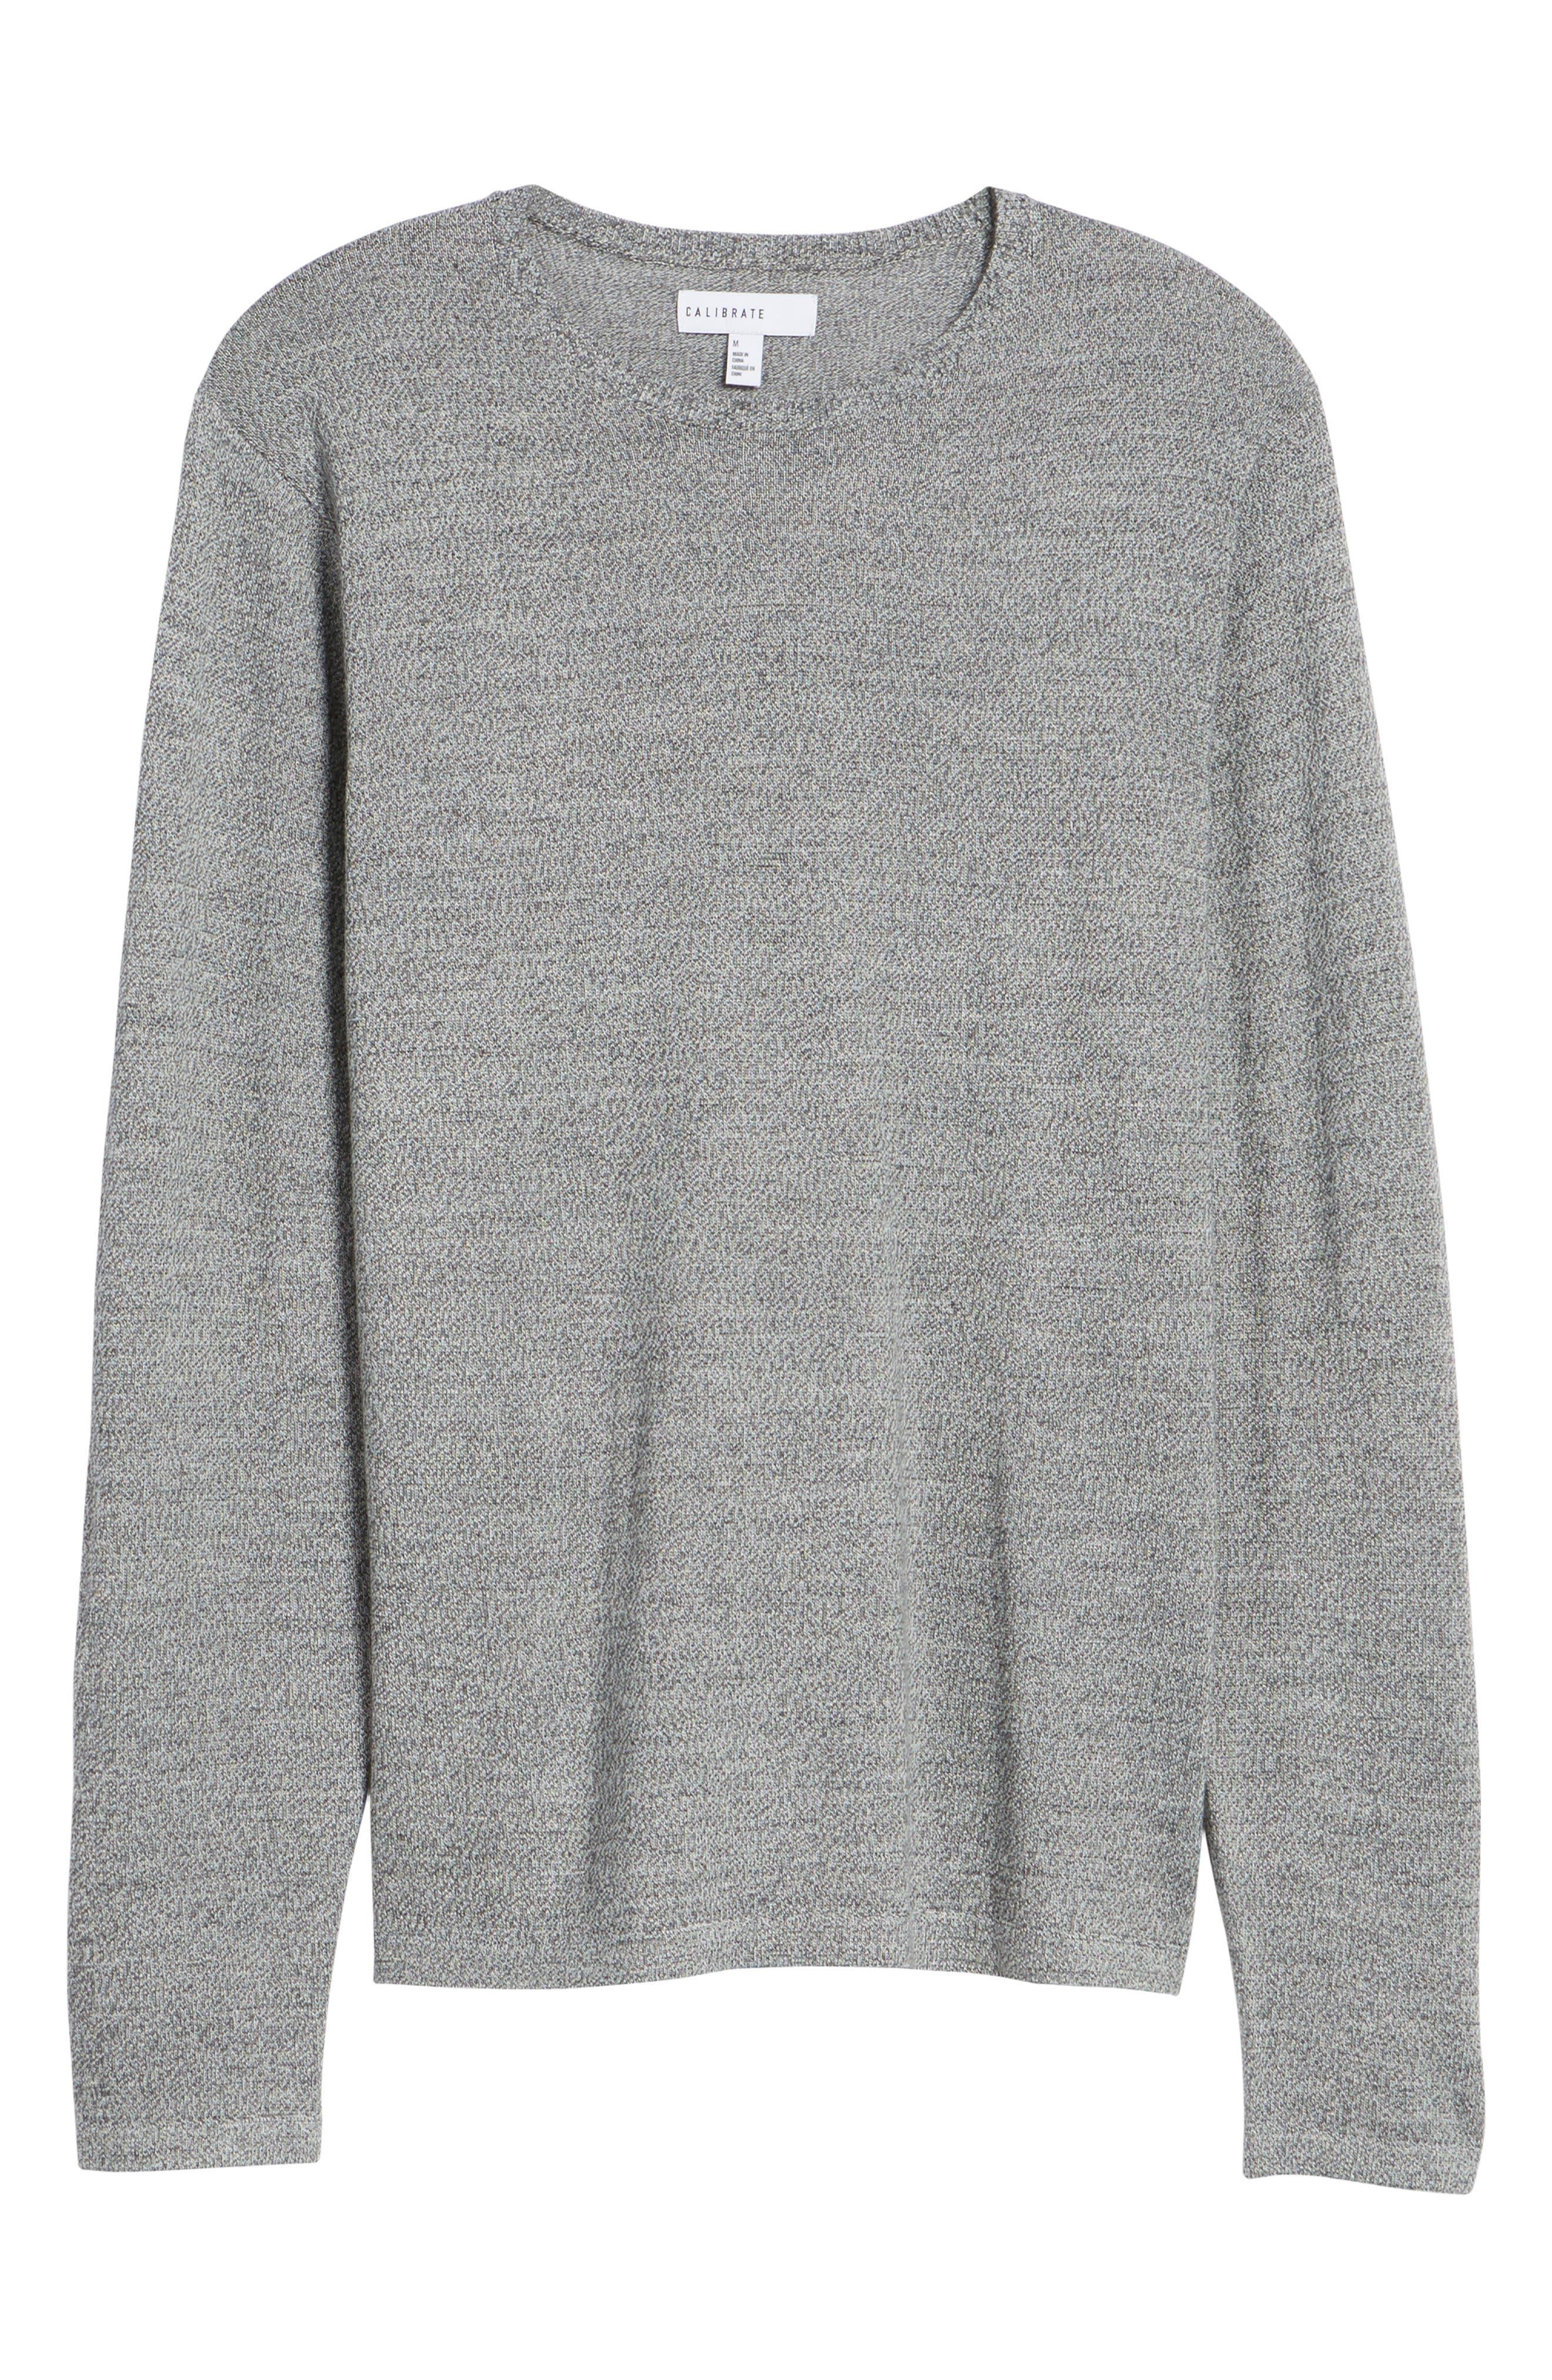 Merino Blend Crewneck Sweater,                             Alternate thumbnail 22, color,